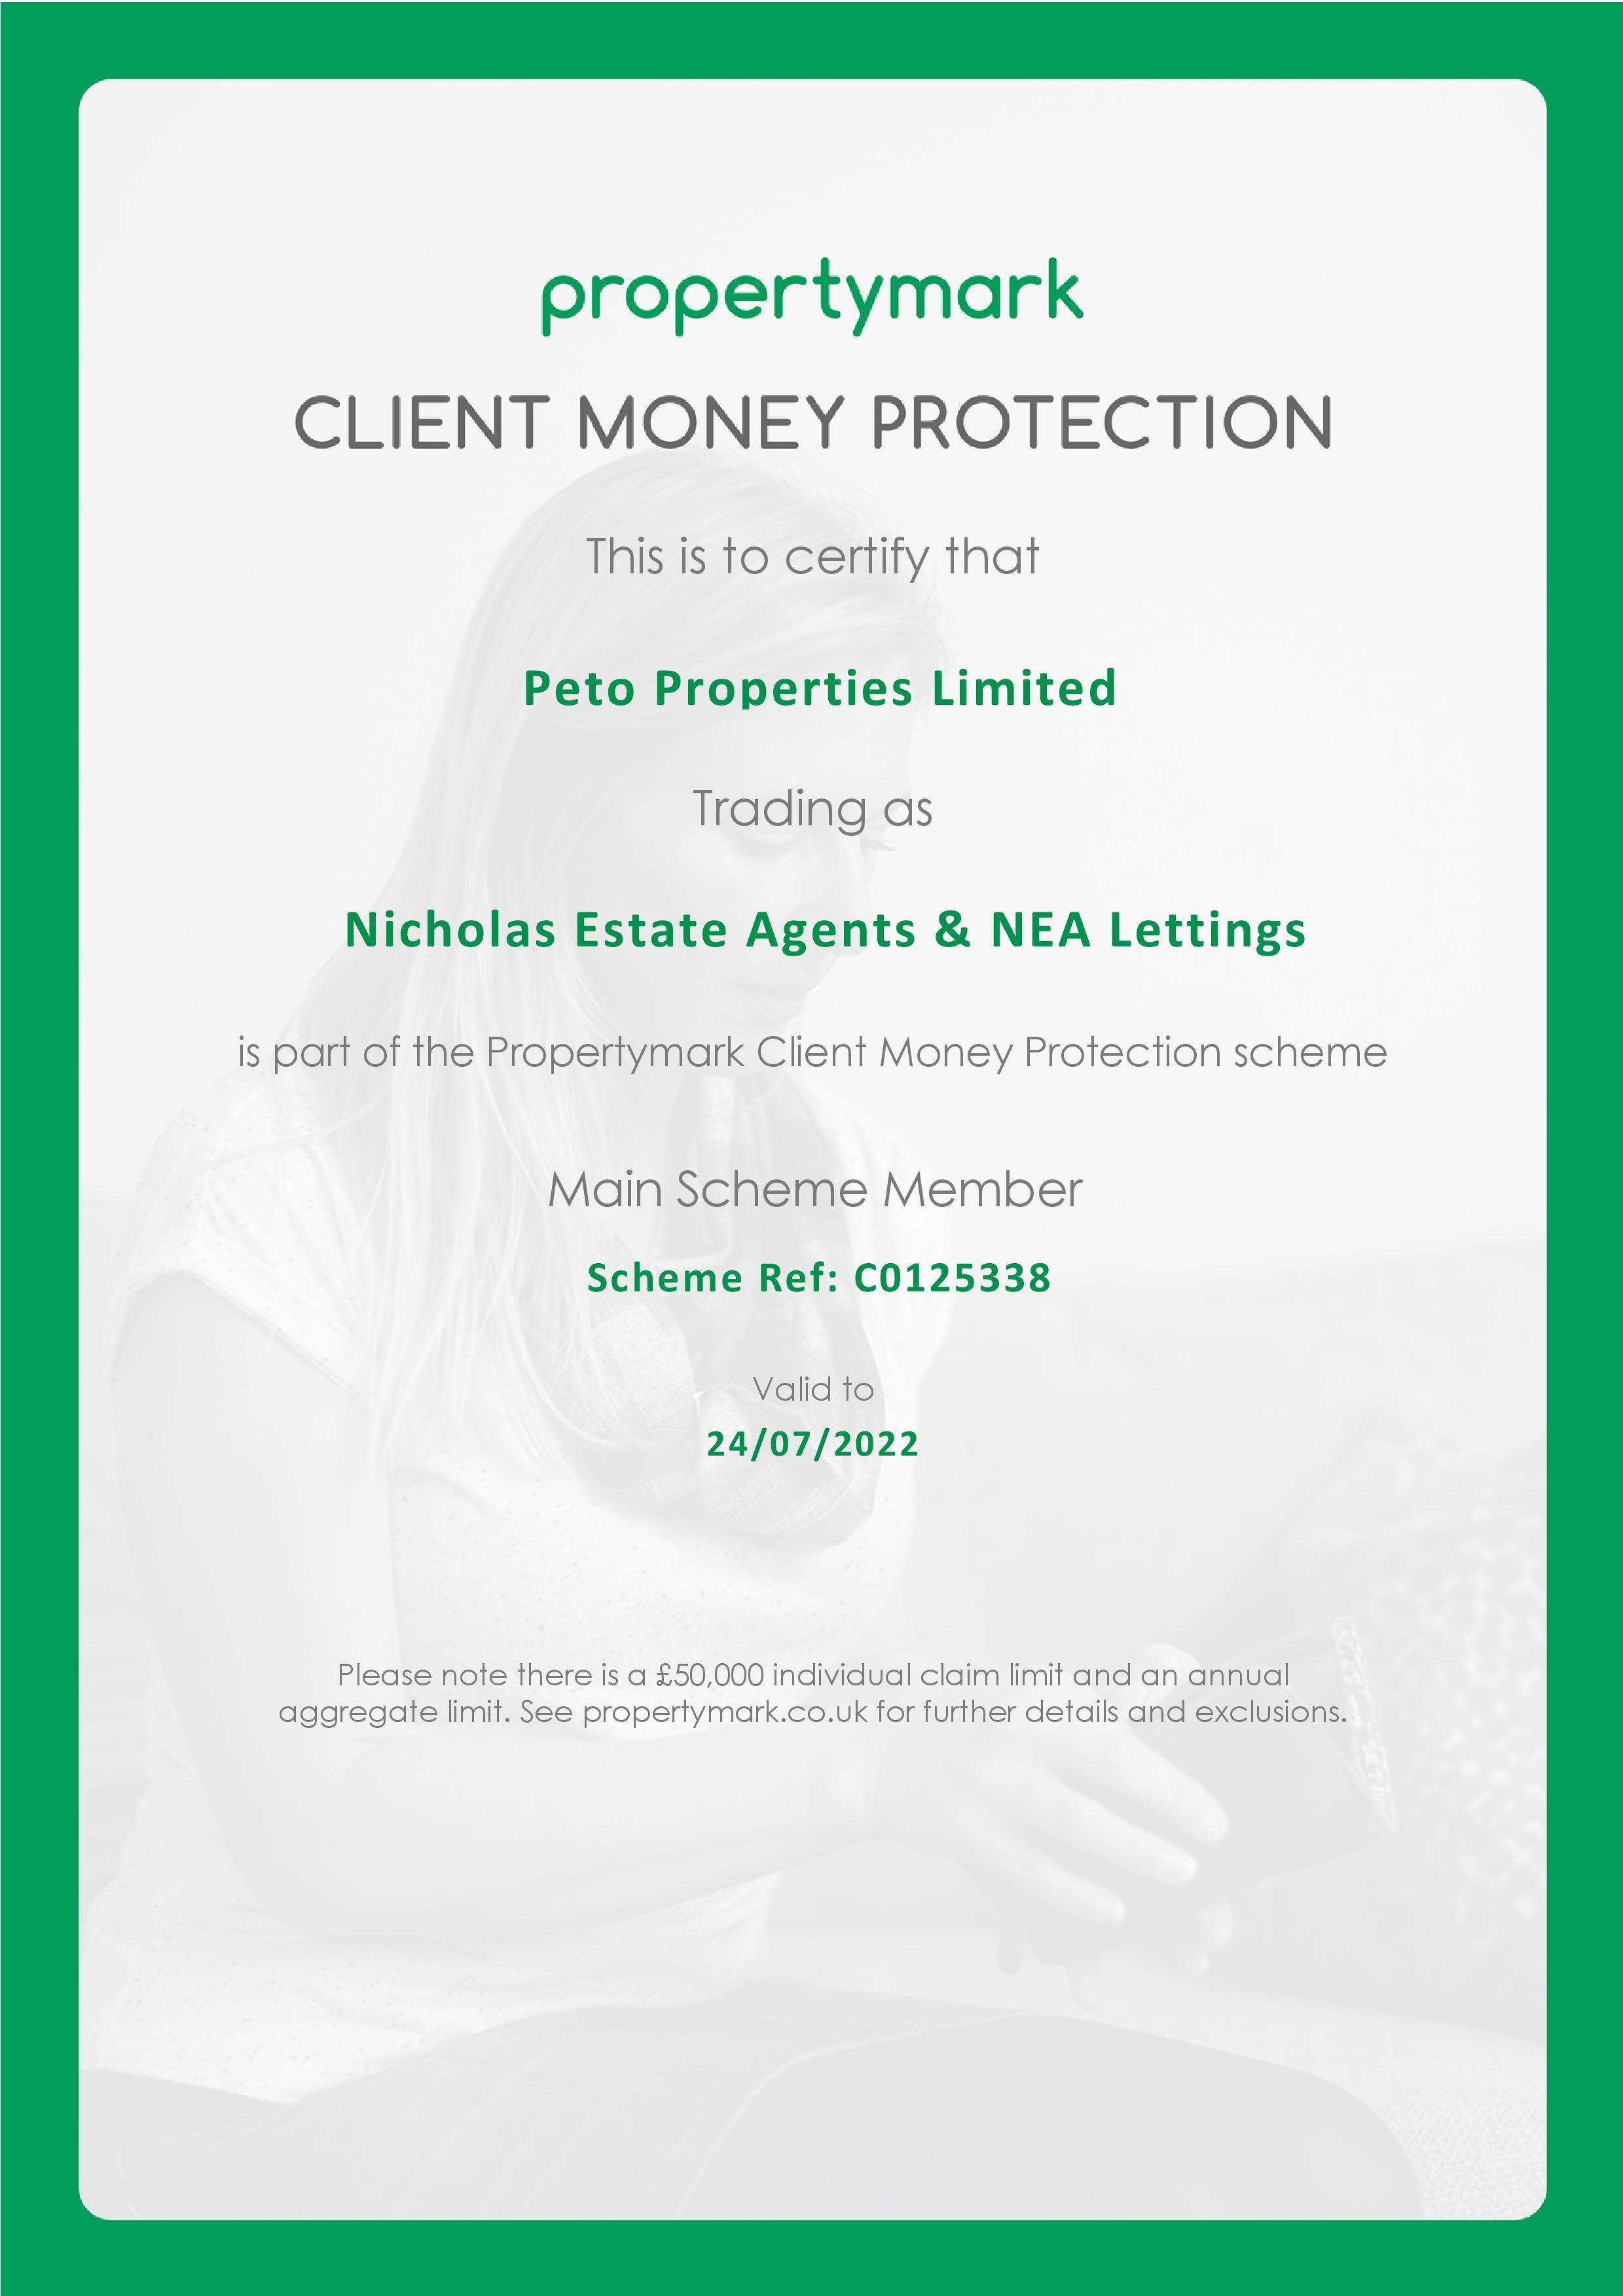 propertymark_cmp_main_scheme_certificate-21-22